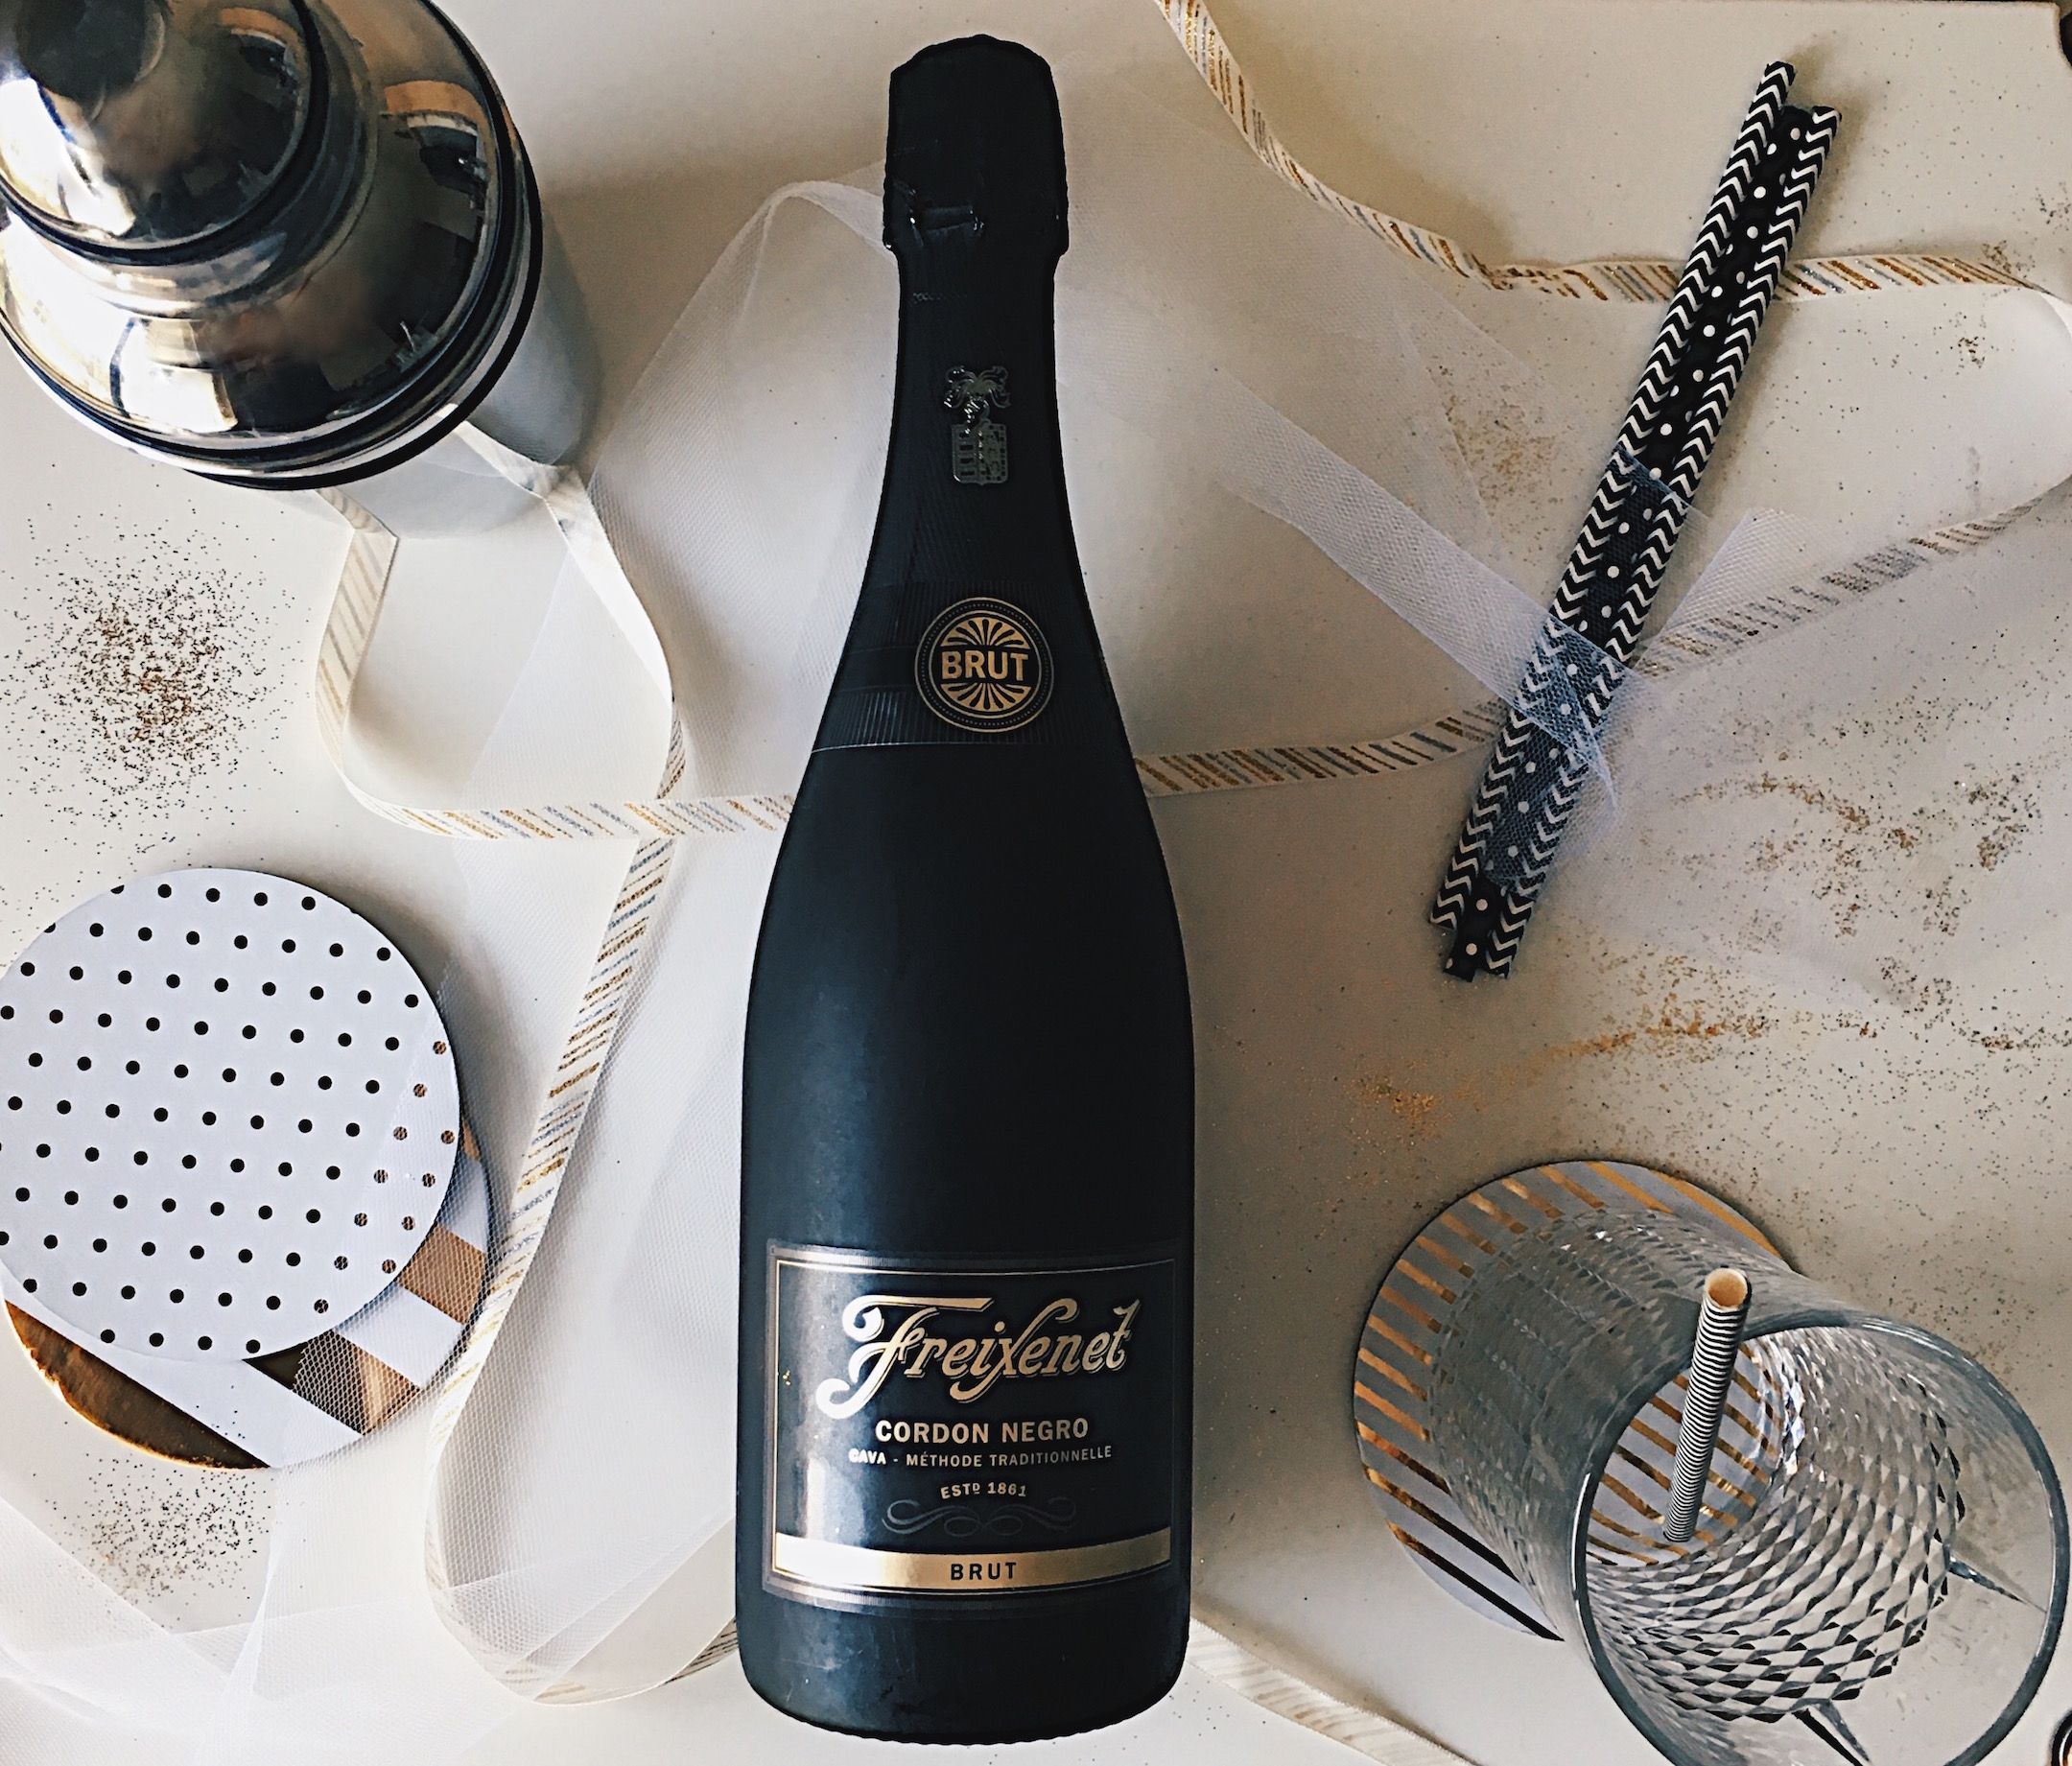 Freixenet Cordon Negro Brut Champagne/ Gold glitter table setting/ Black and White Paper straws/ silver shaker